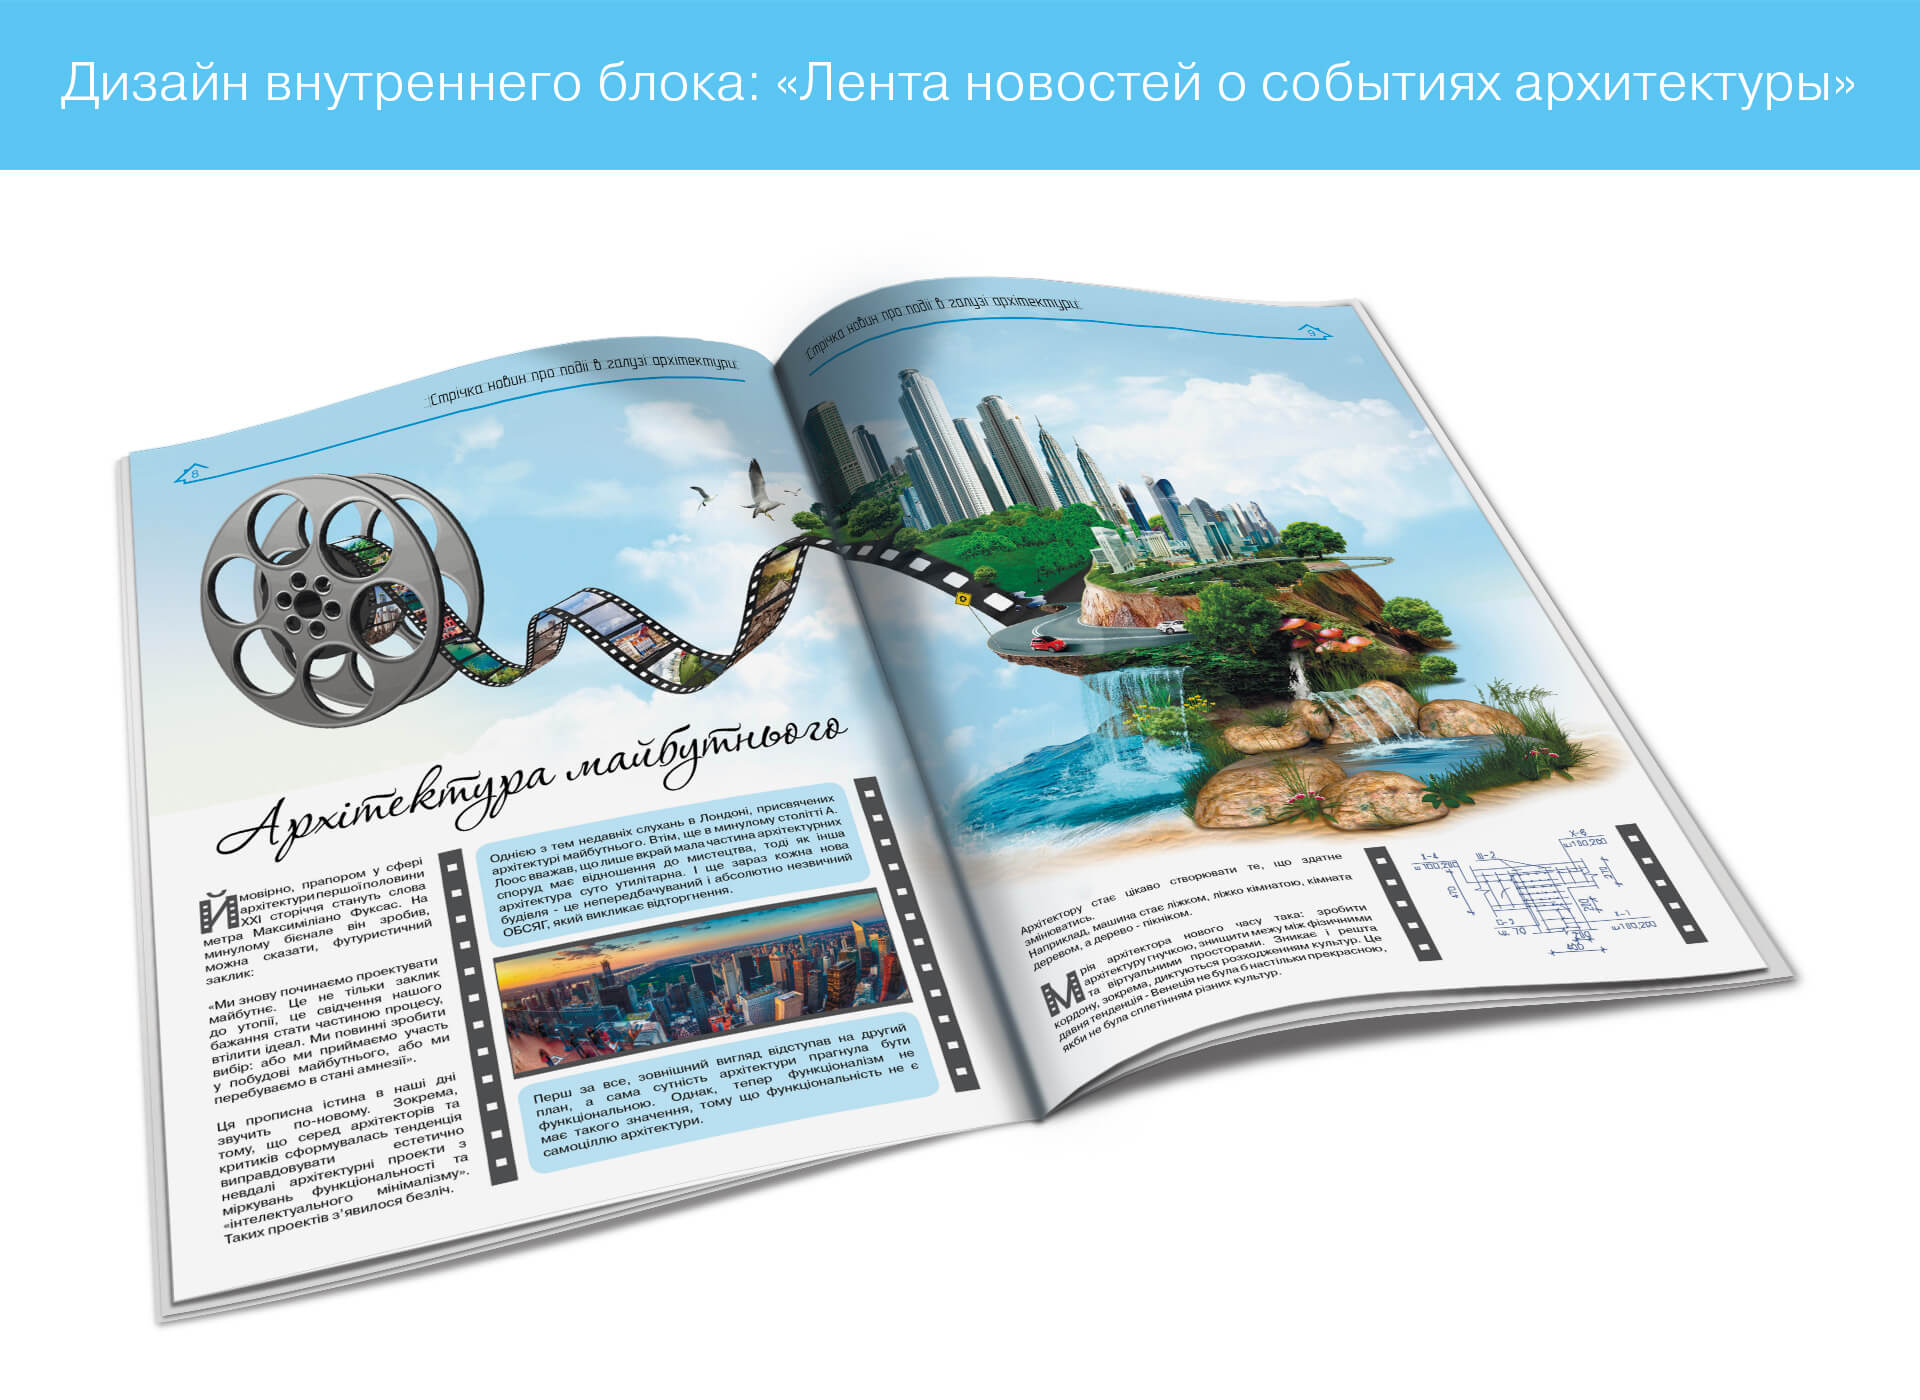 Prokochuk_Irina_architectural magazine Sporuda_5